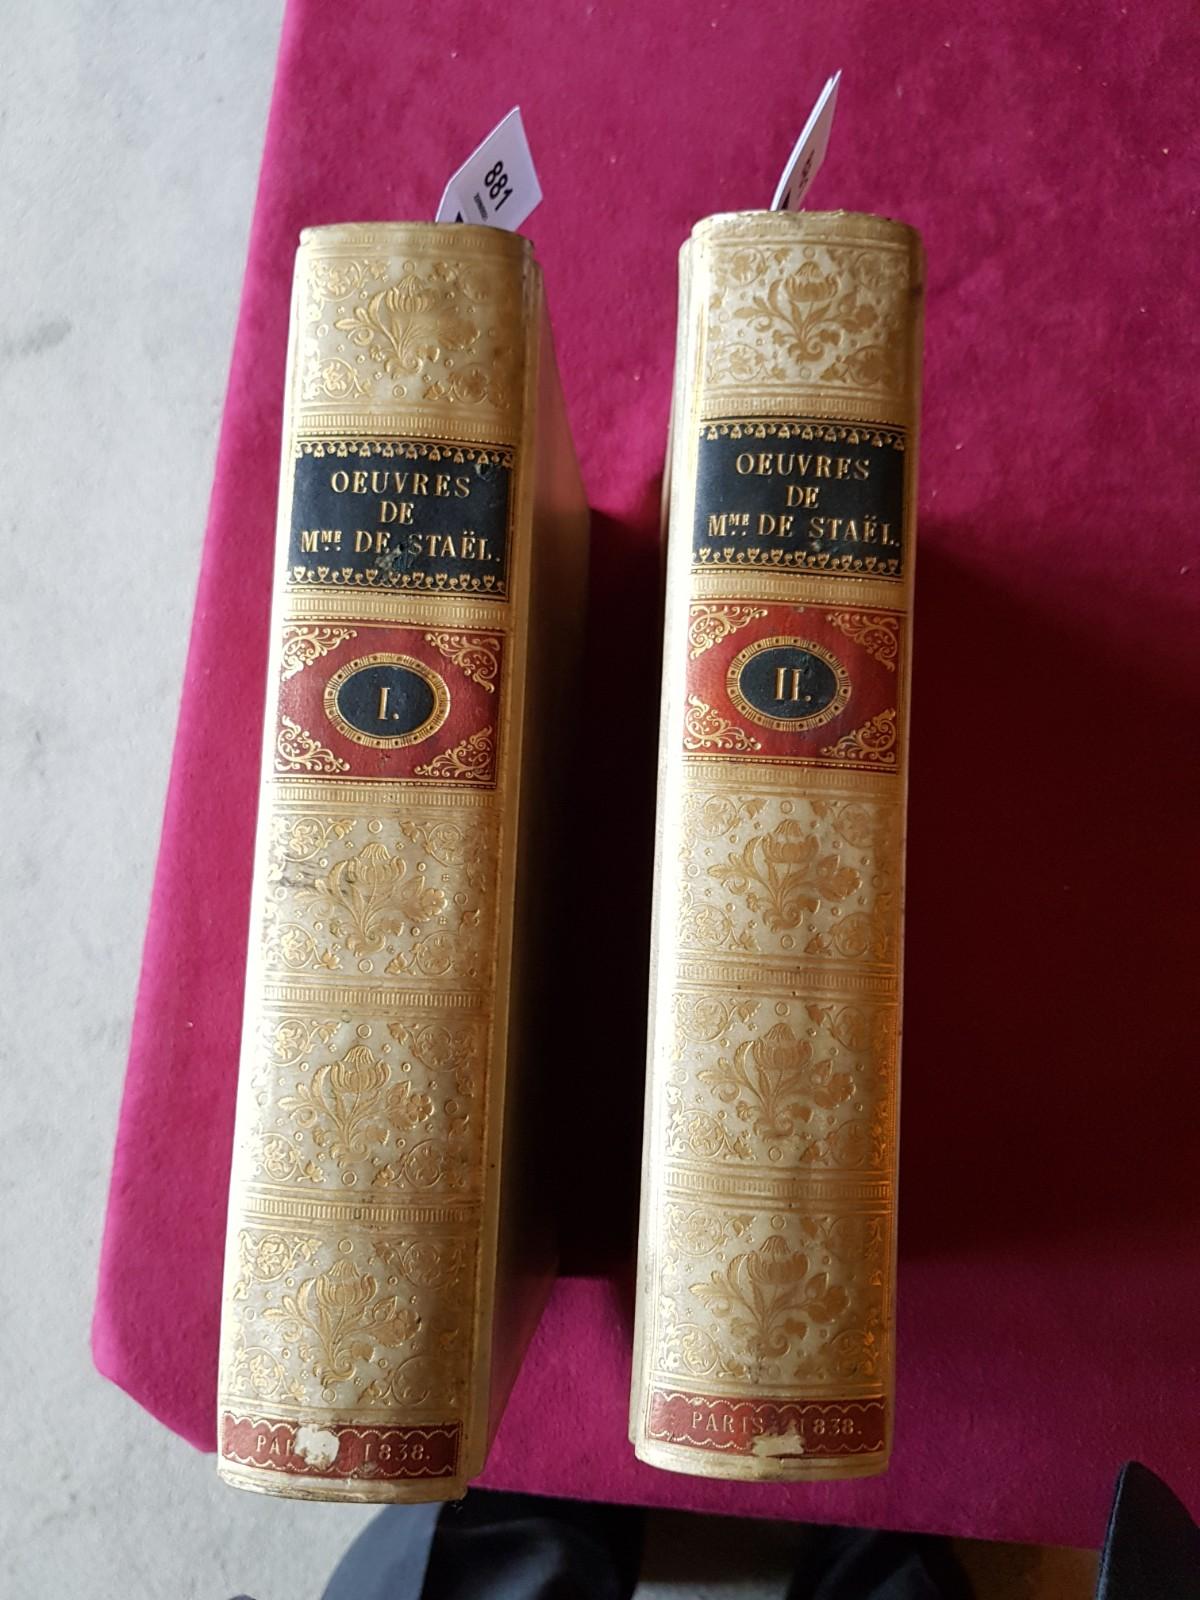 De Stael (Madame)ÿOeuvres Completes de Madame la Baronne de Stael-Holstein, 2 vols. folio Paris ( - Image 7 of 8